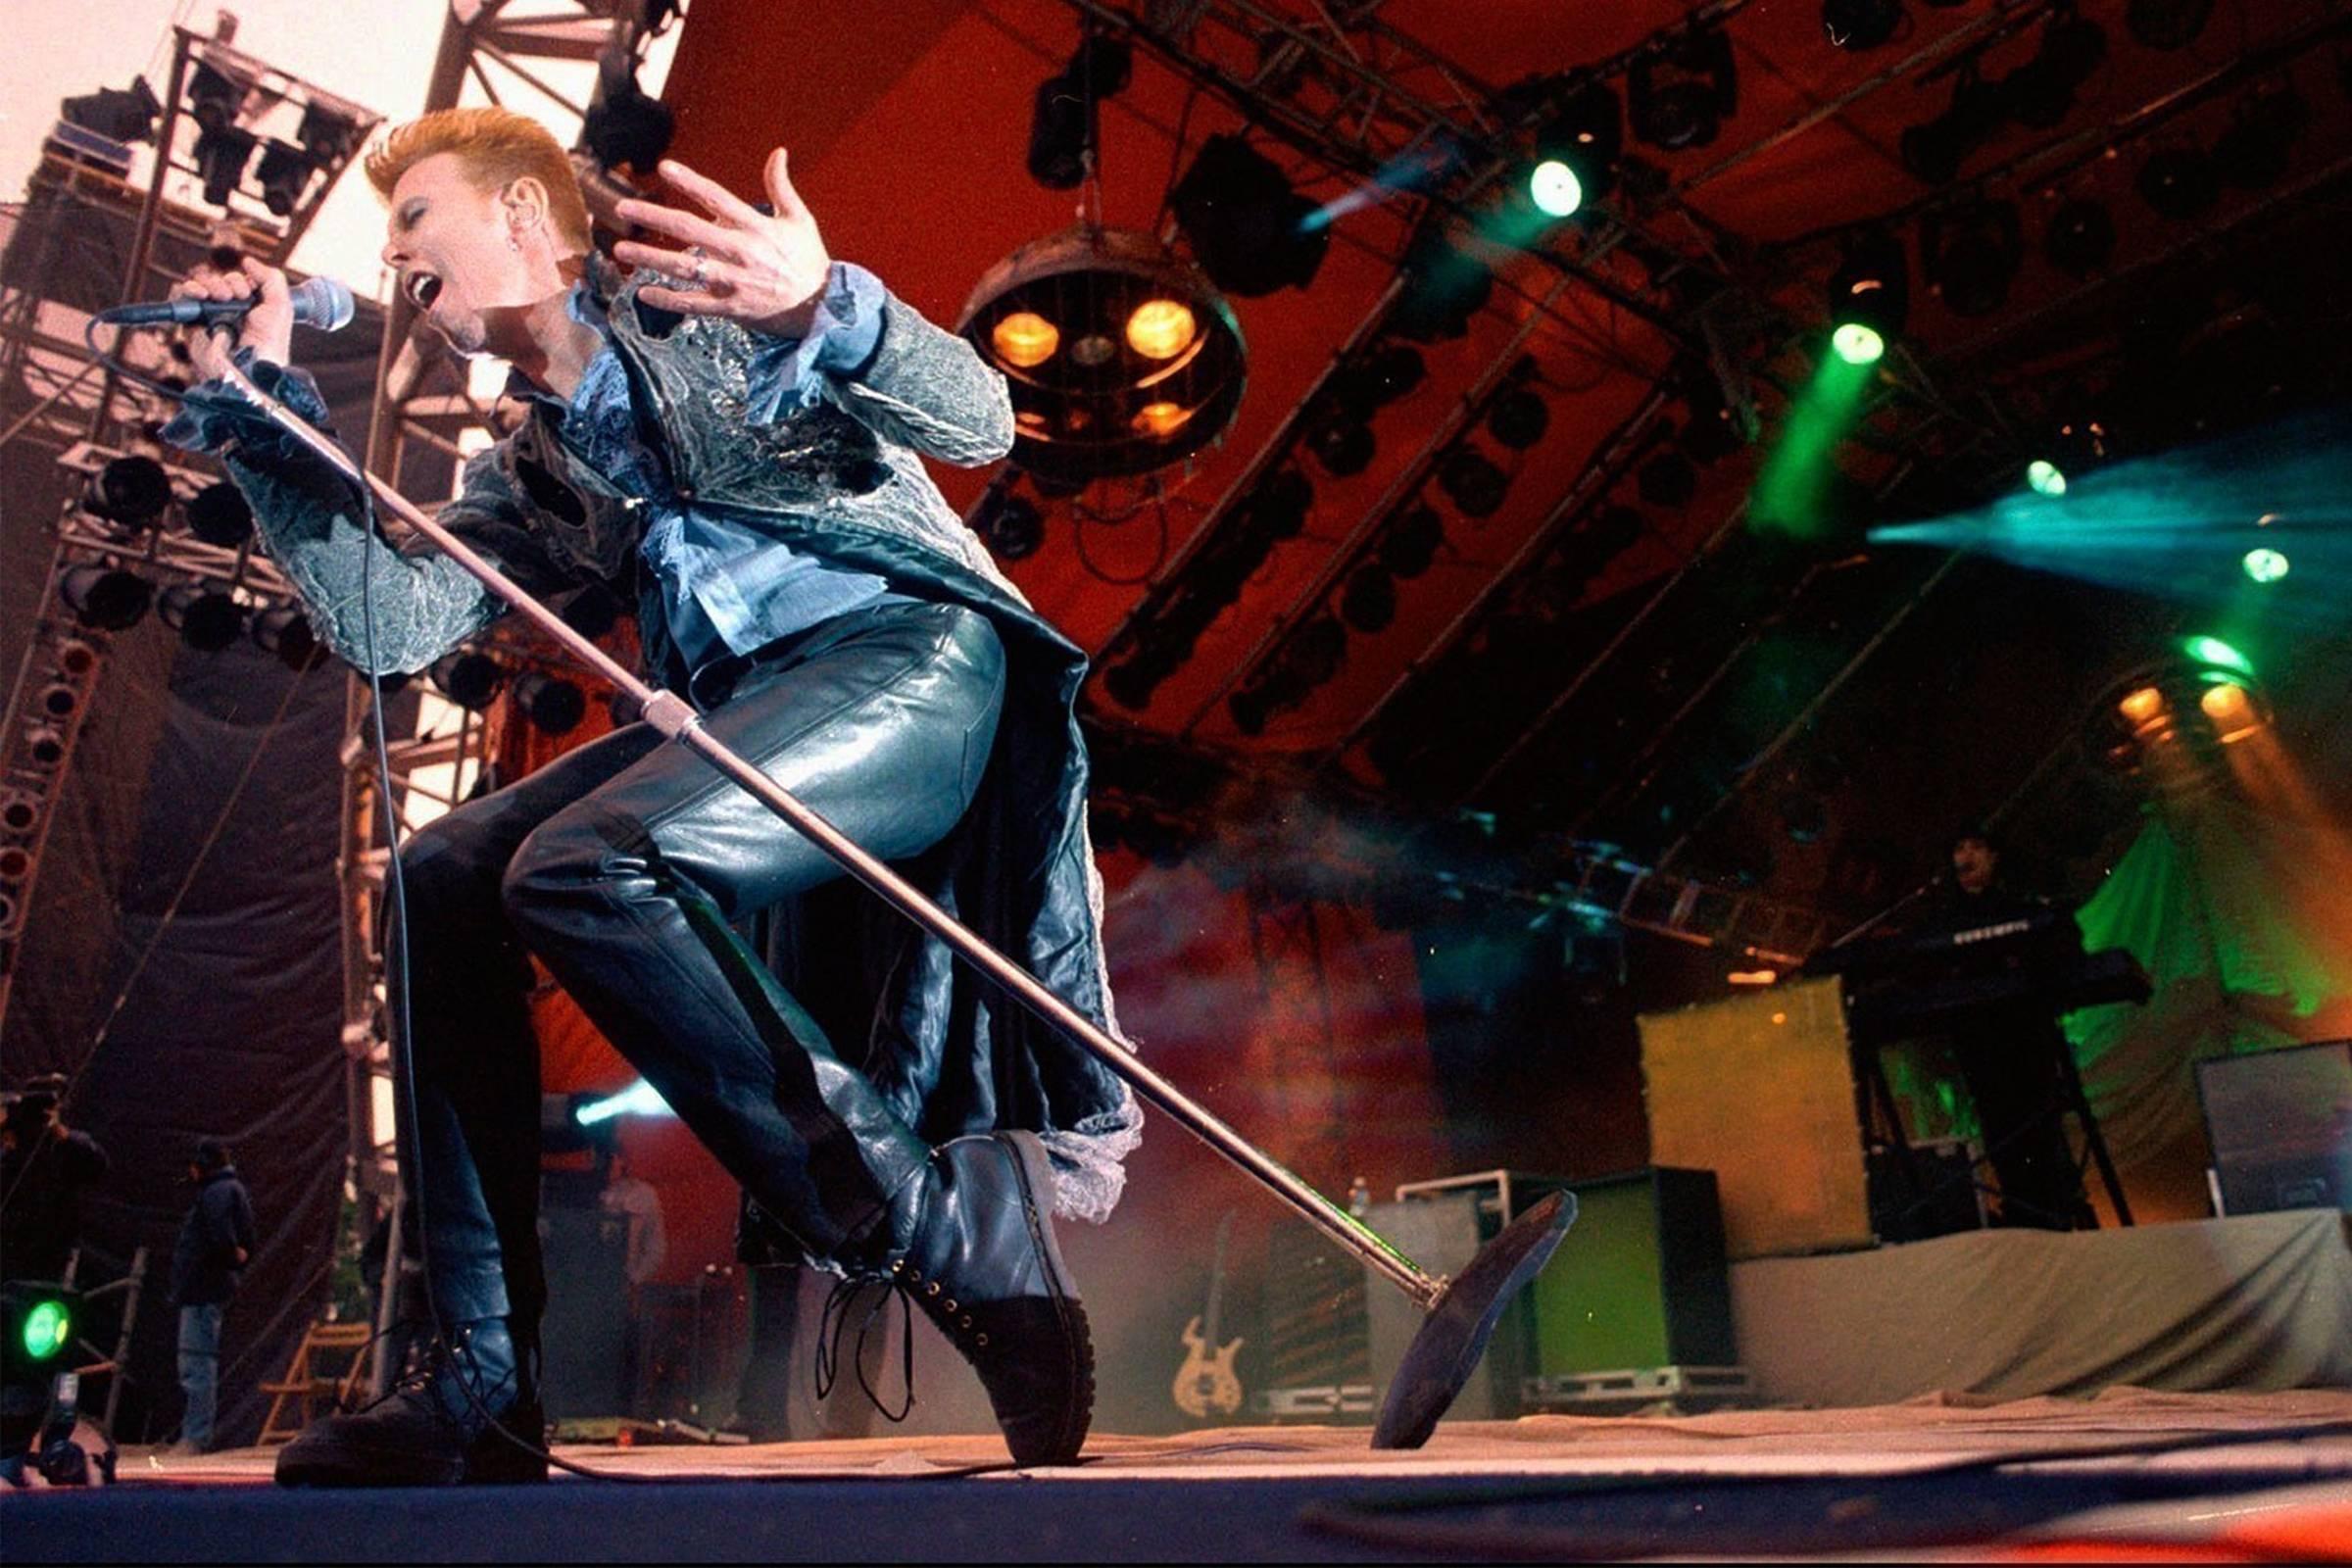 Дэвид Боуи на фестивале Roskilde Festival в Дании в 1996 году